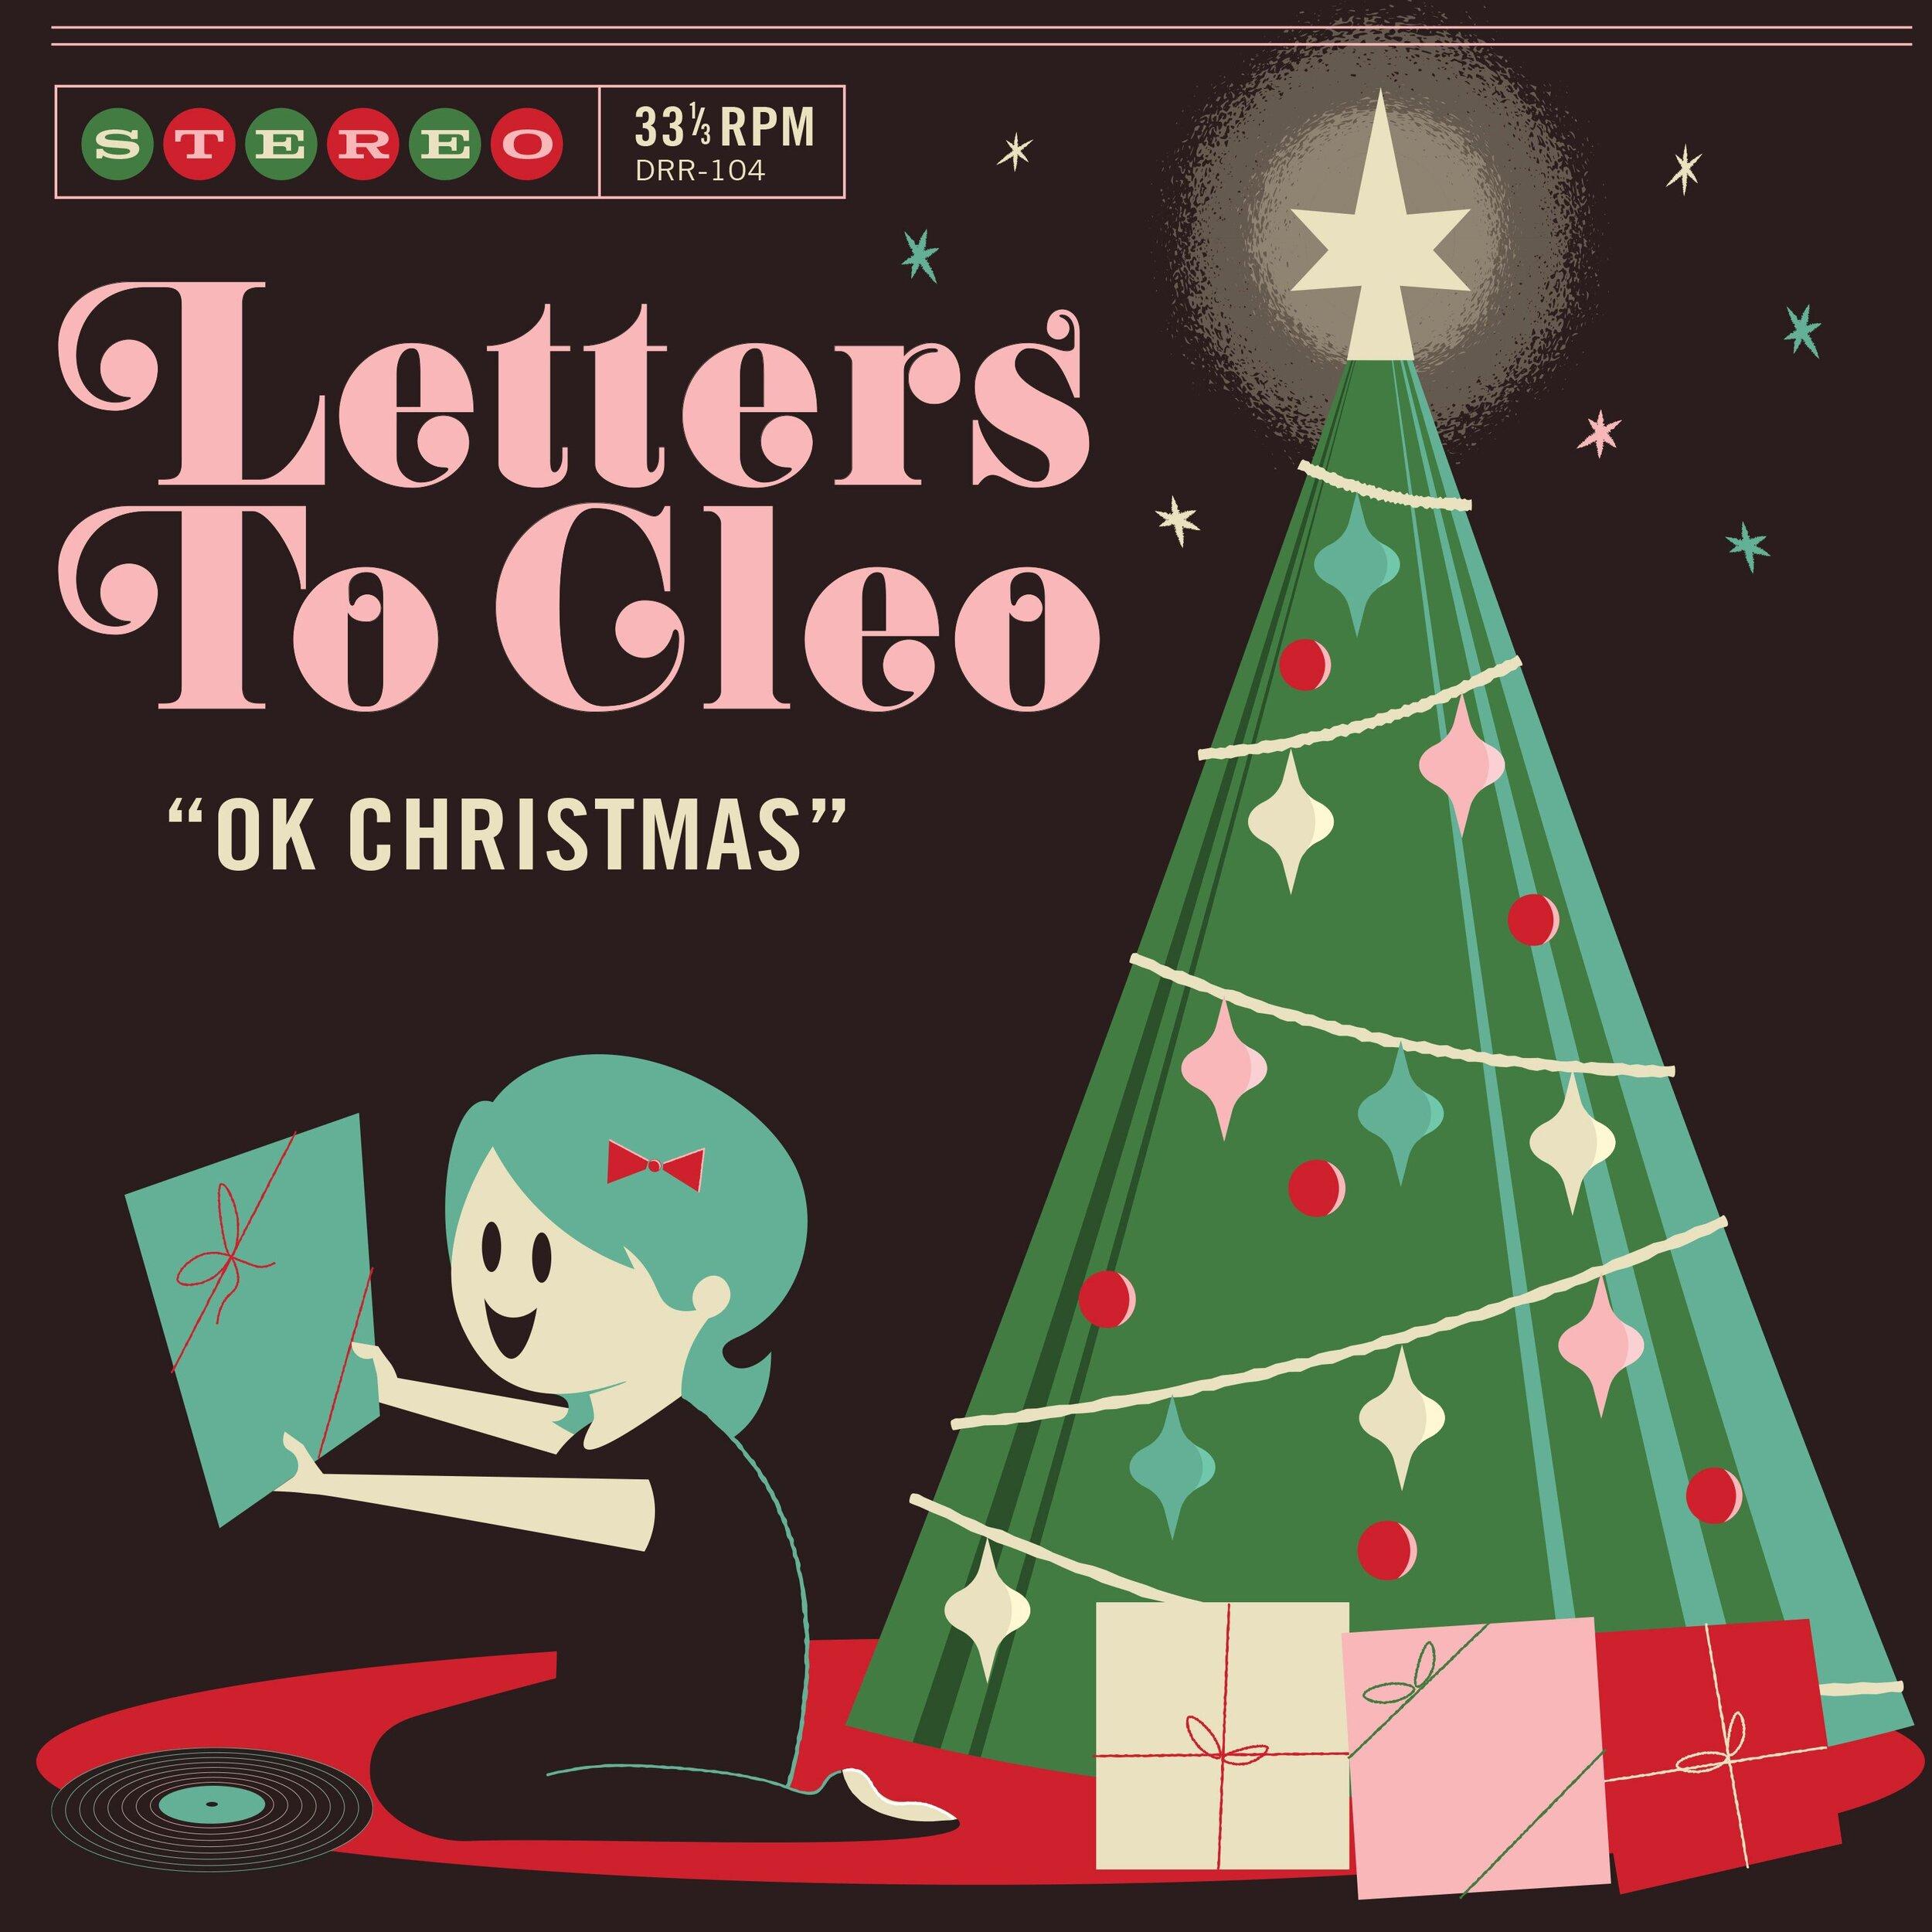 LTC_ok_christmas.jpg